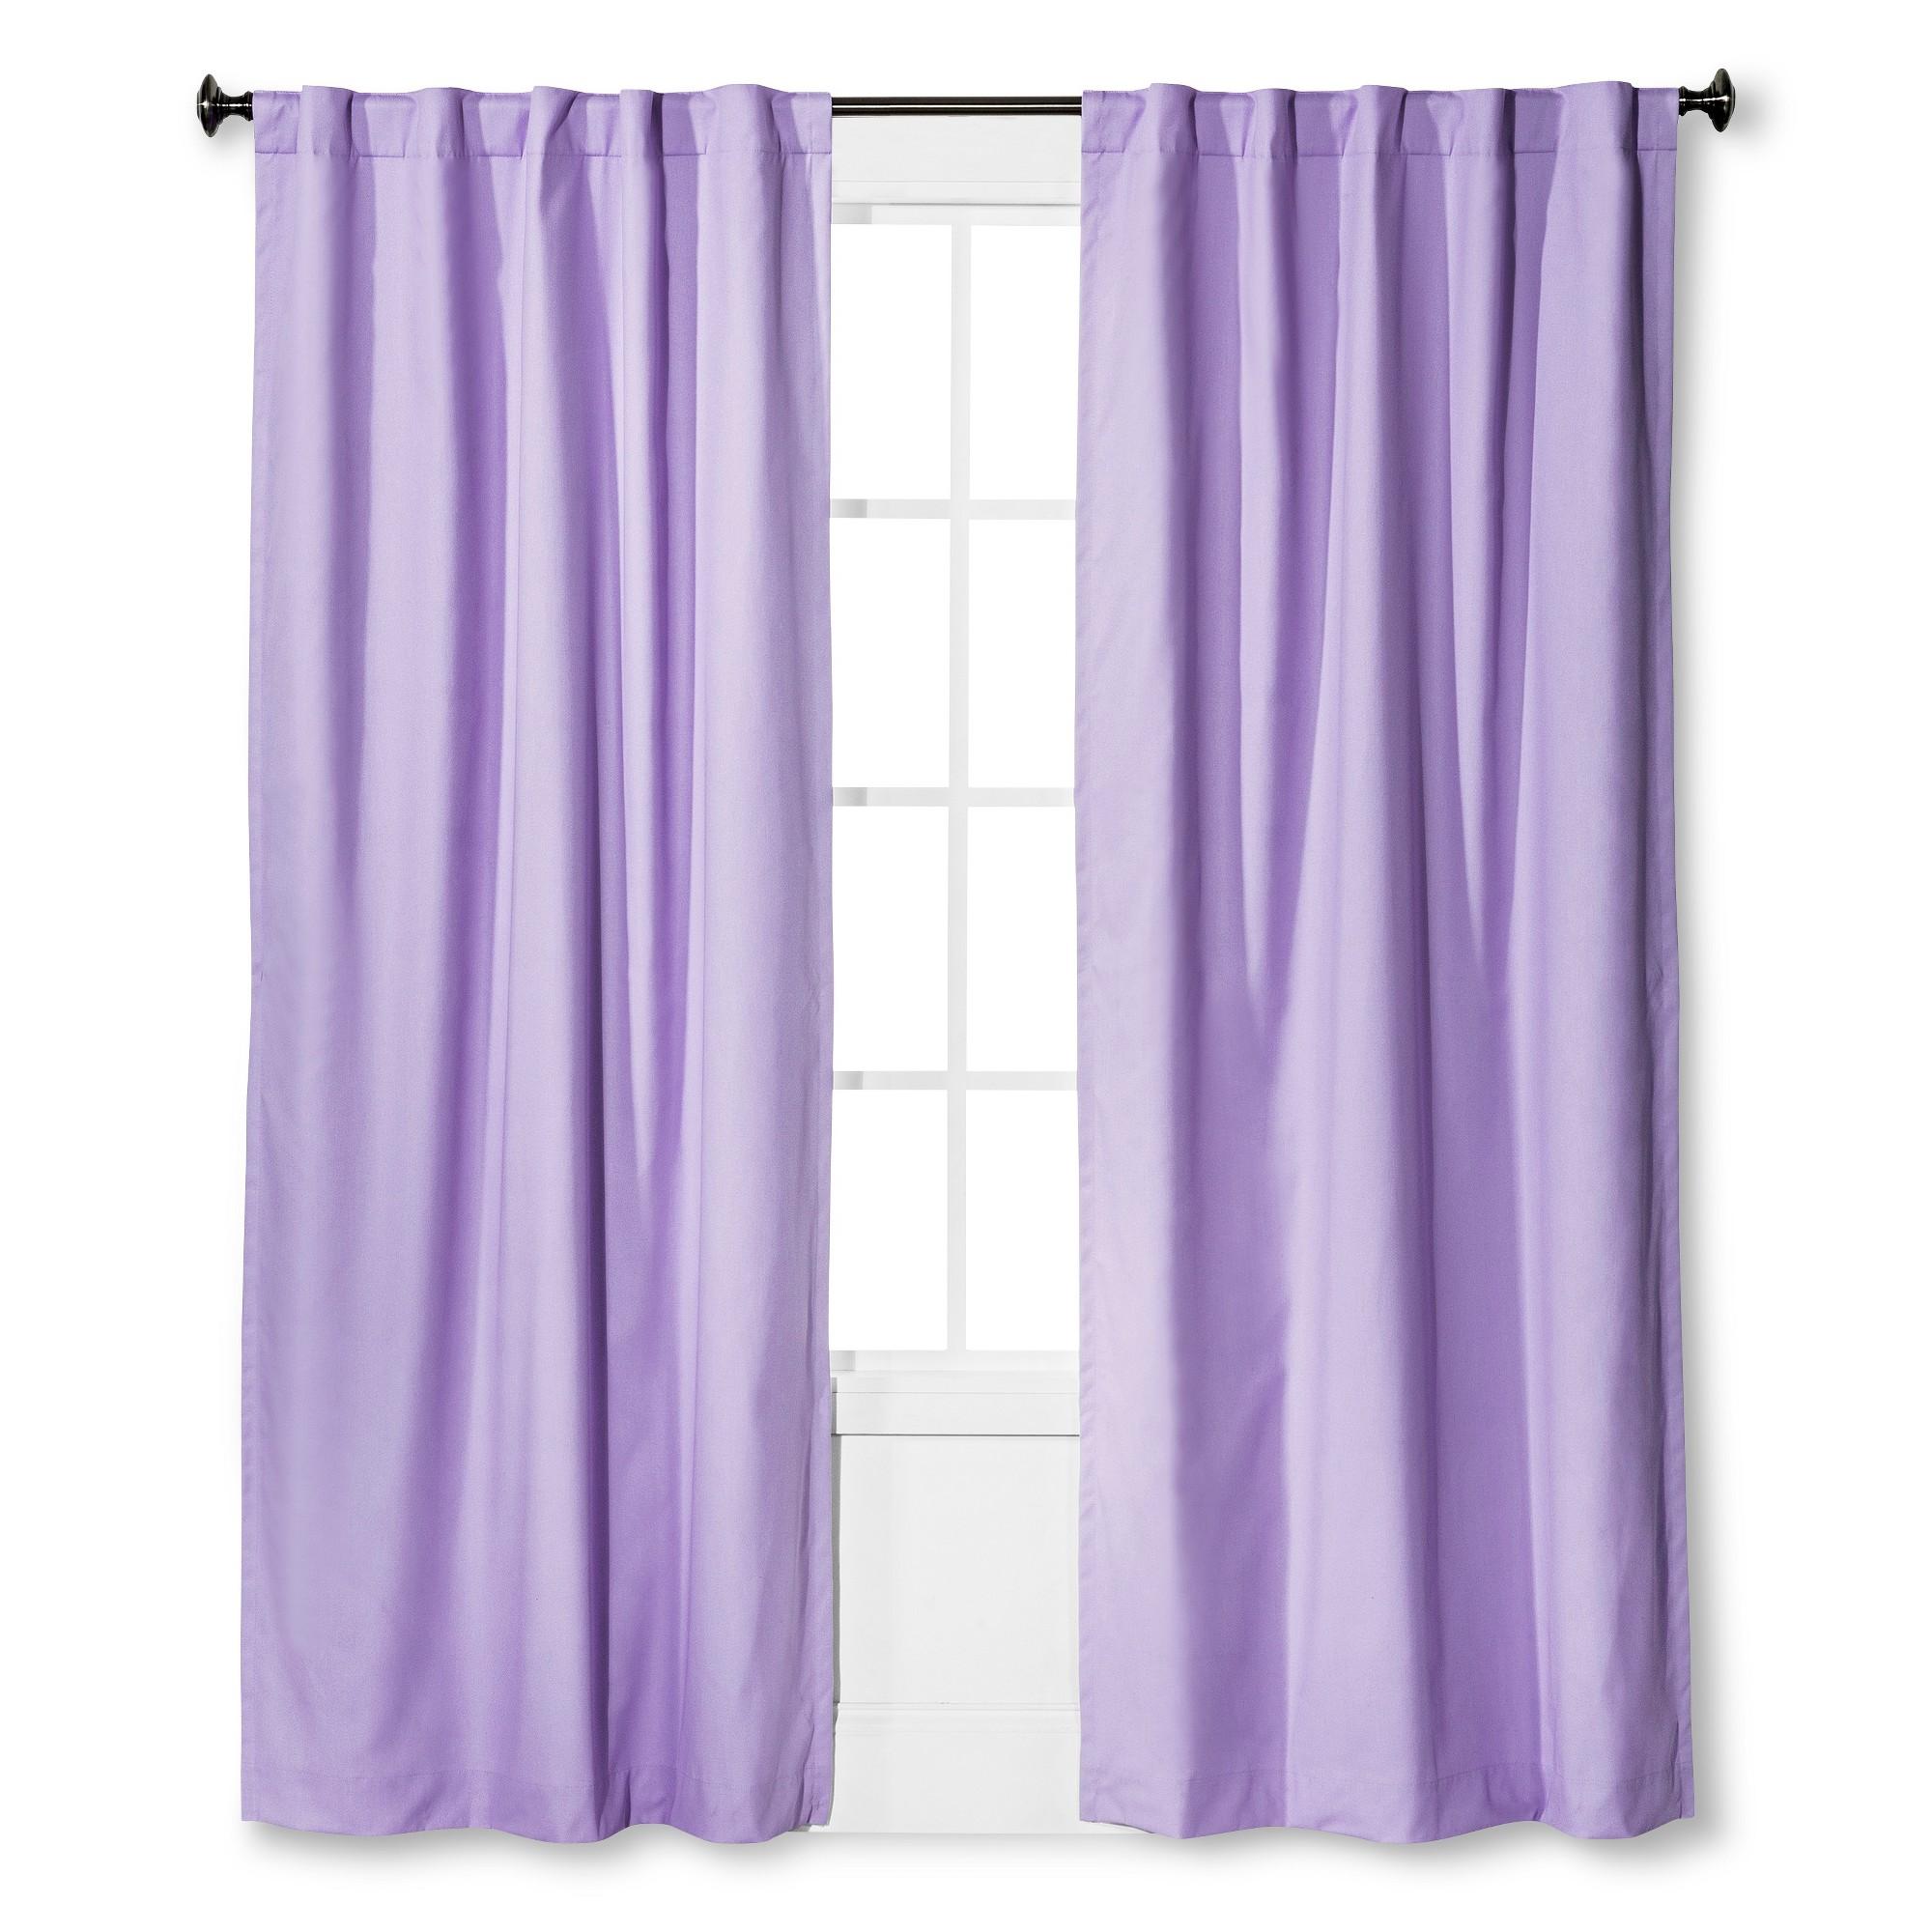 Twill Blackout Curtain Panel Lavender 42 X63 Pillowfort